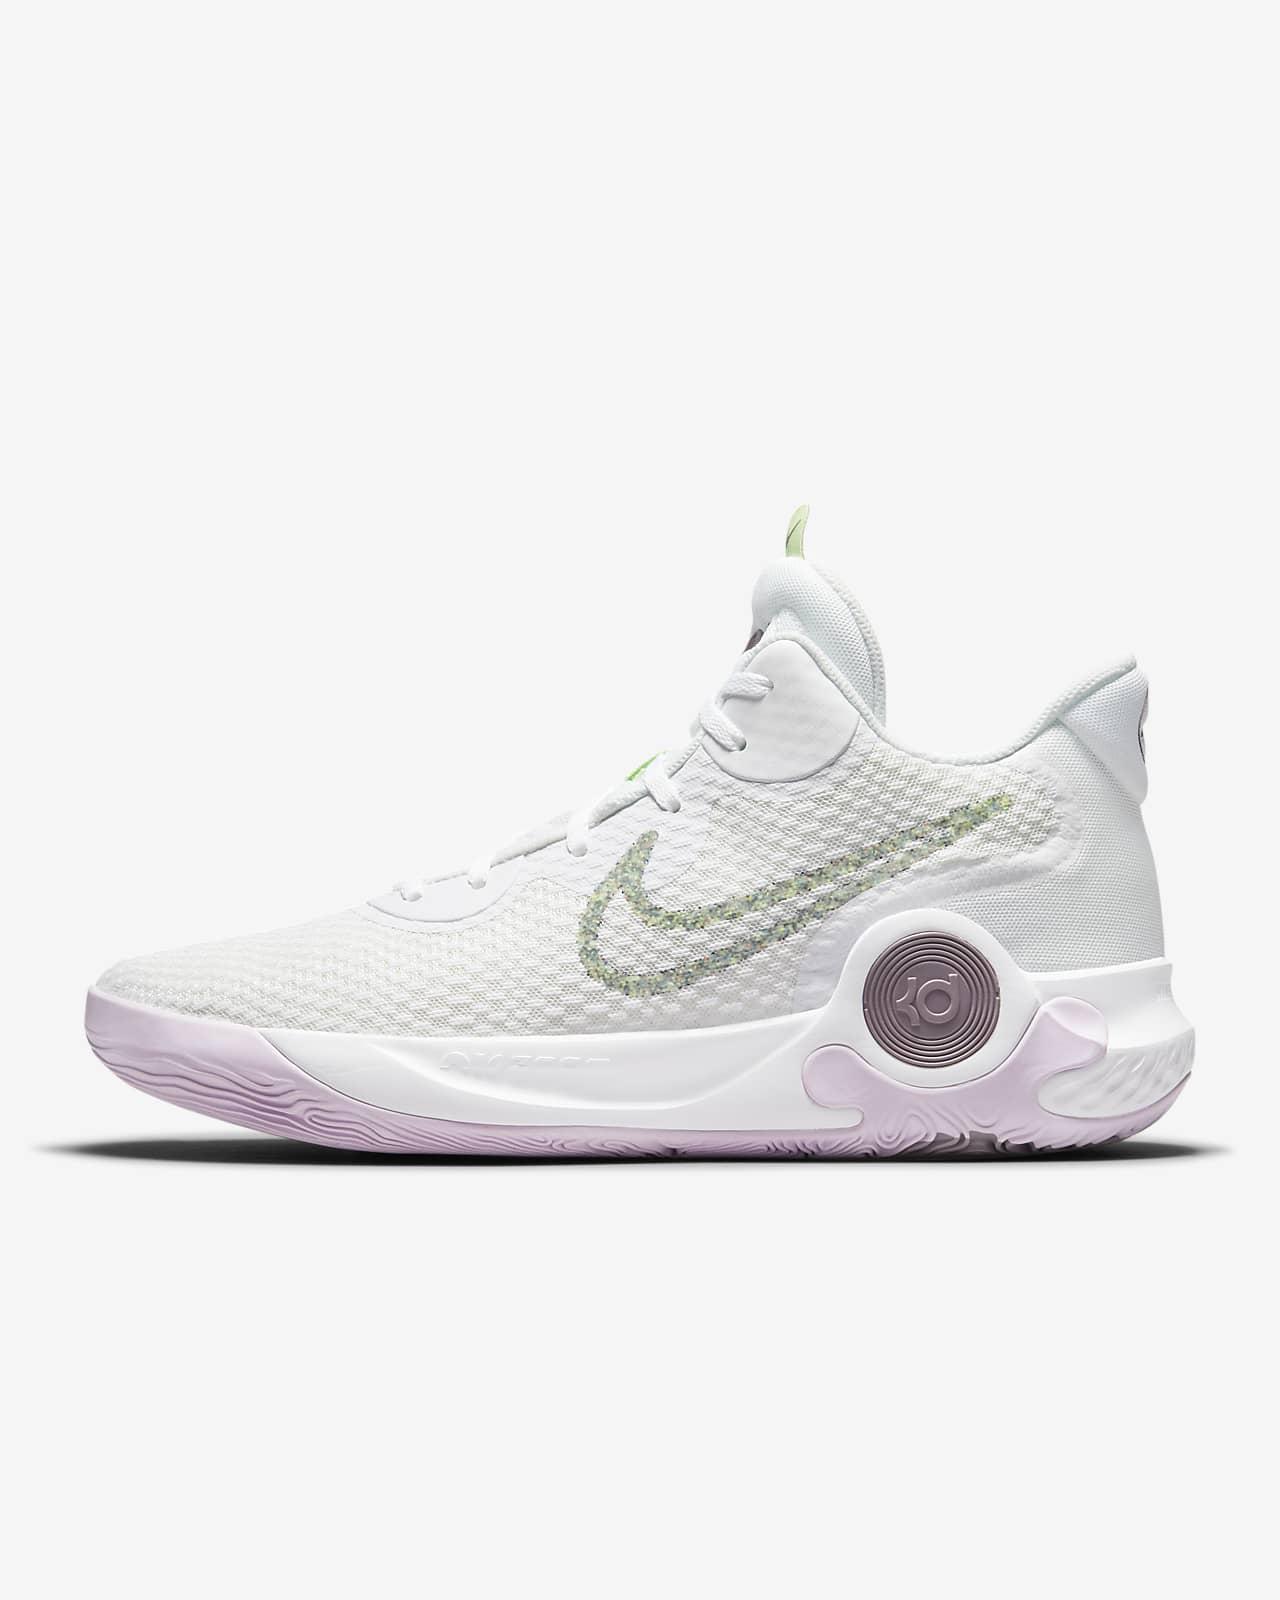 KD Trey 5 IX Basketball Shoe